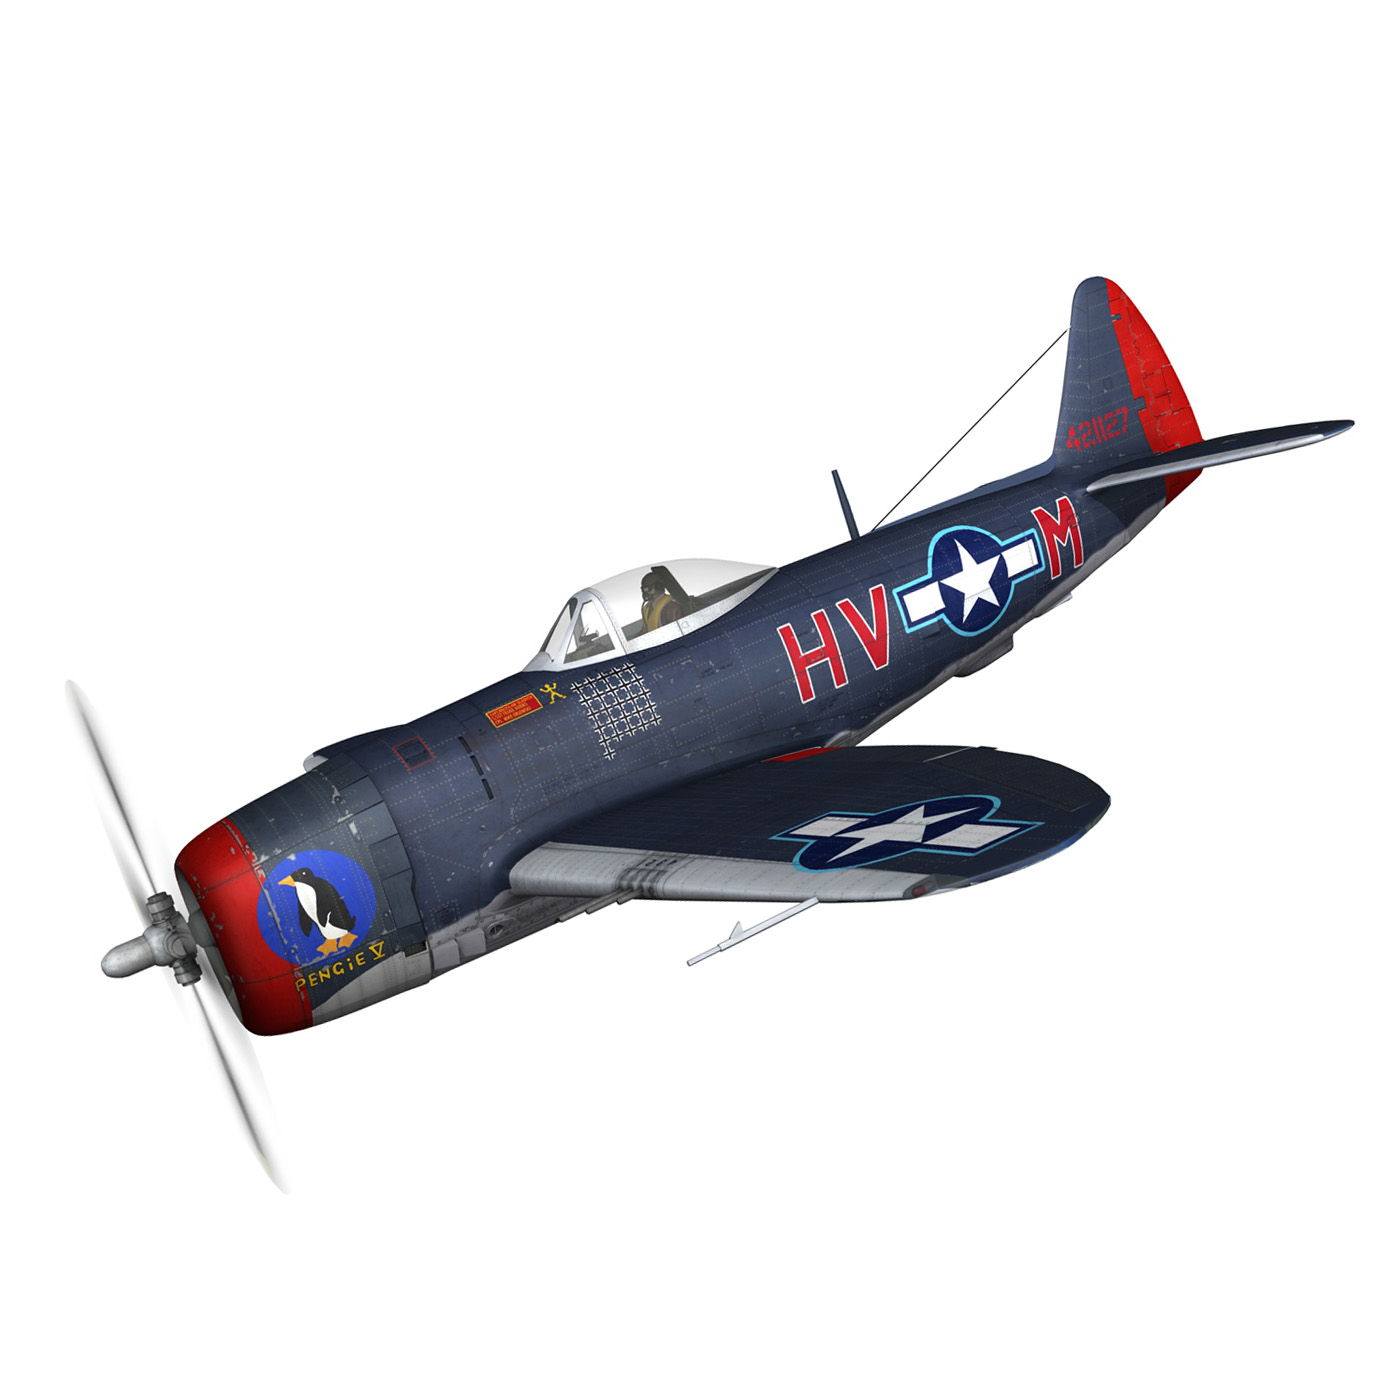 republic p-47m thunderbolt – pengie v 3d model 3ds c4d fbx lwo lw lws obj 279715